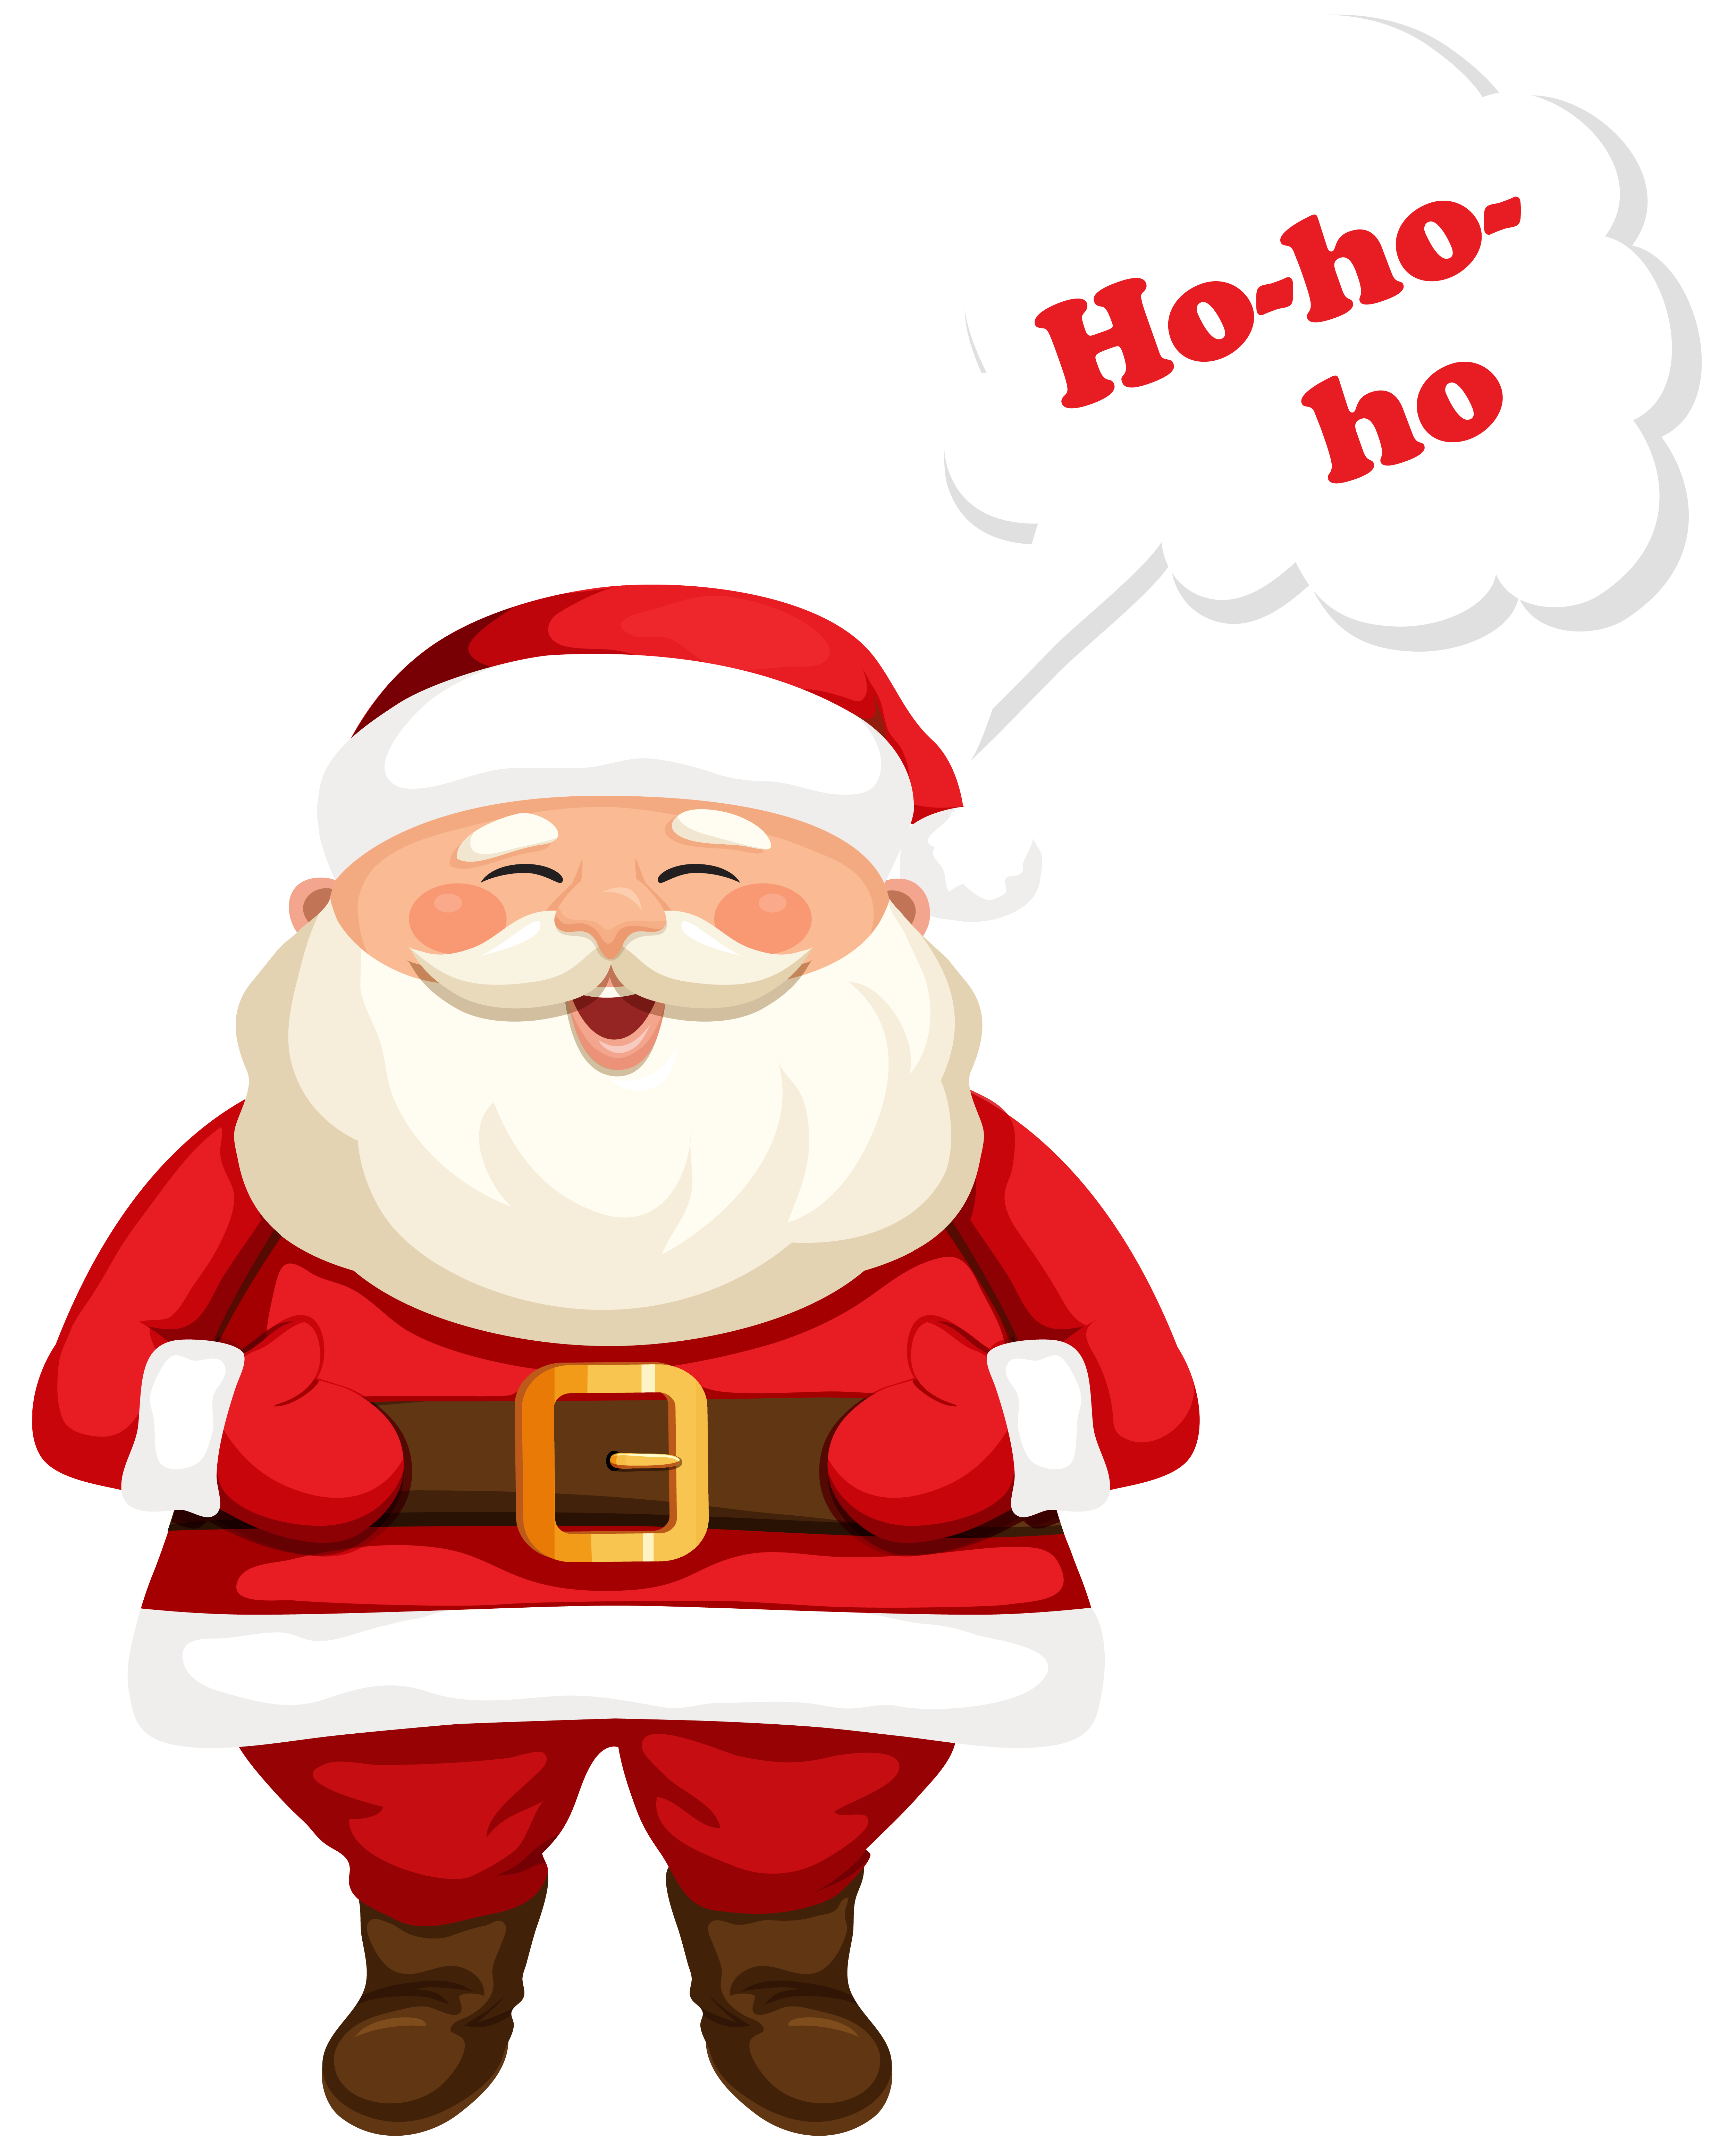 Transparent ho ho ho clipart png freeuse library Santa Claus Ho-Ho-Ho PNG Clipart Image | Gallery ... png freeuse library